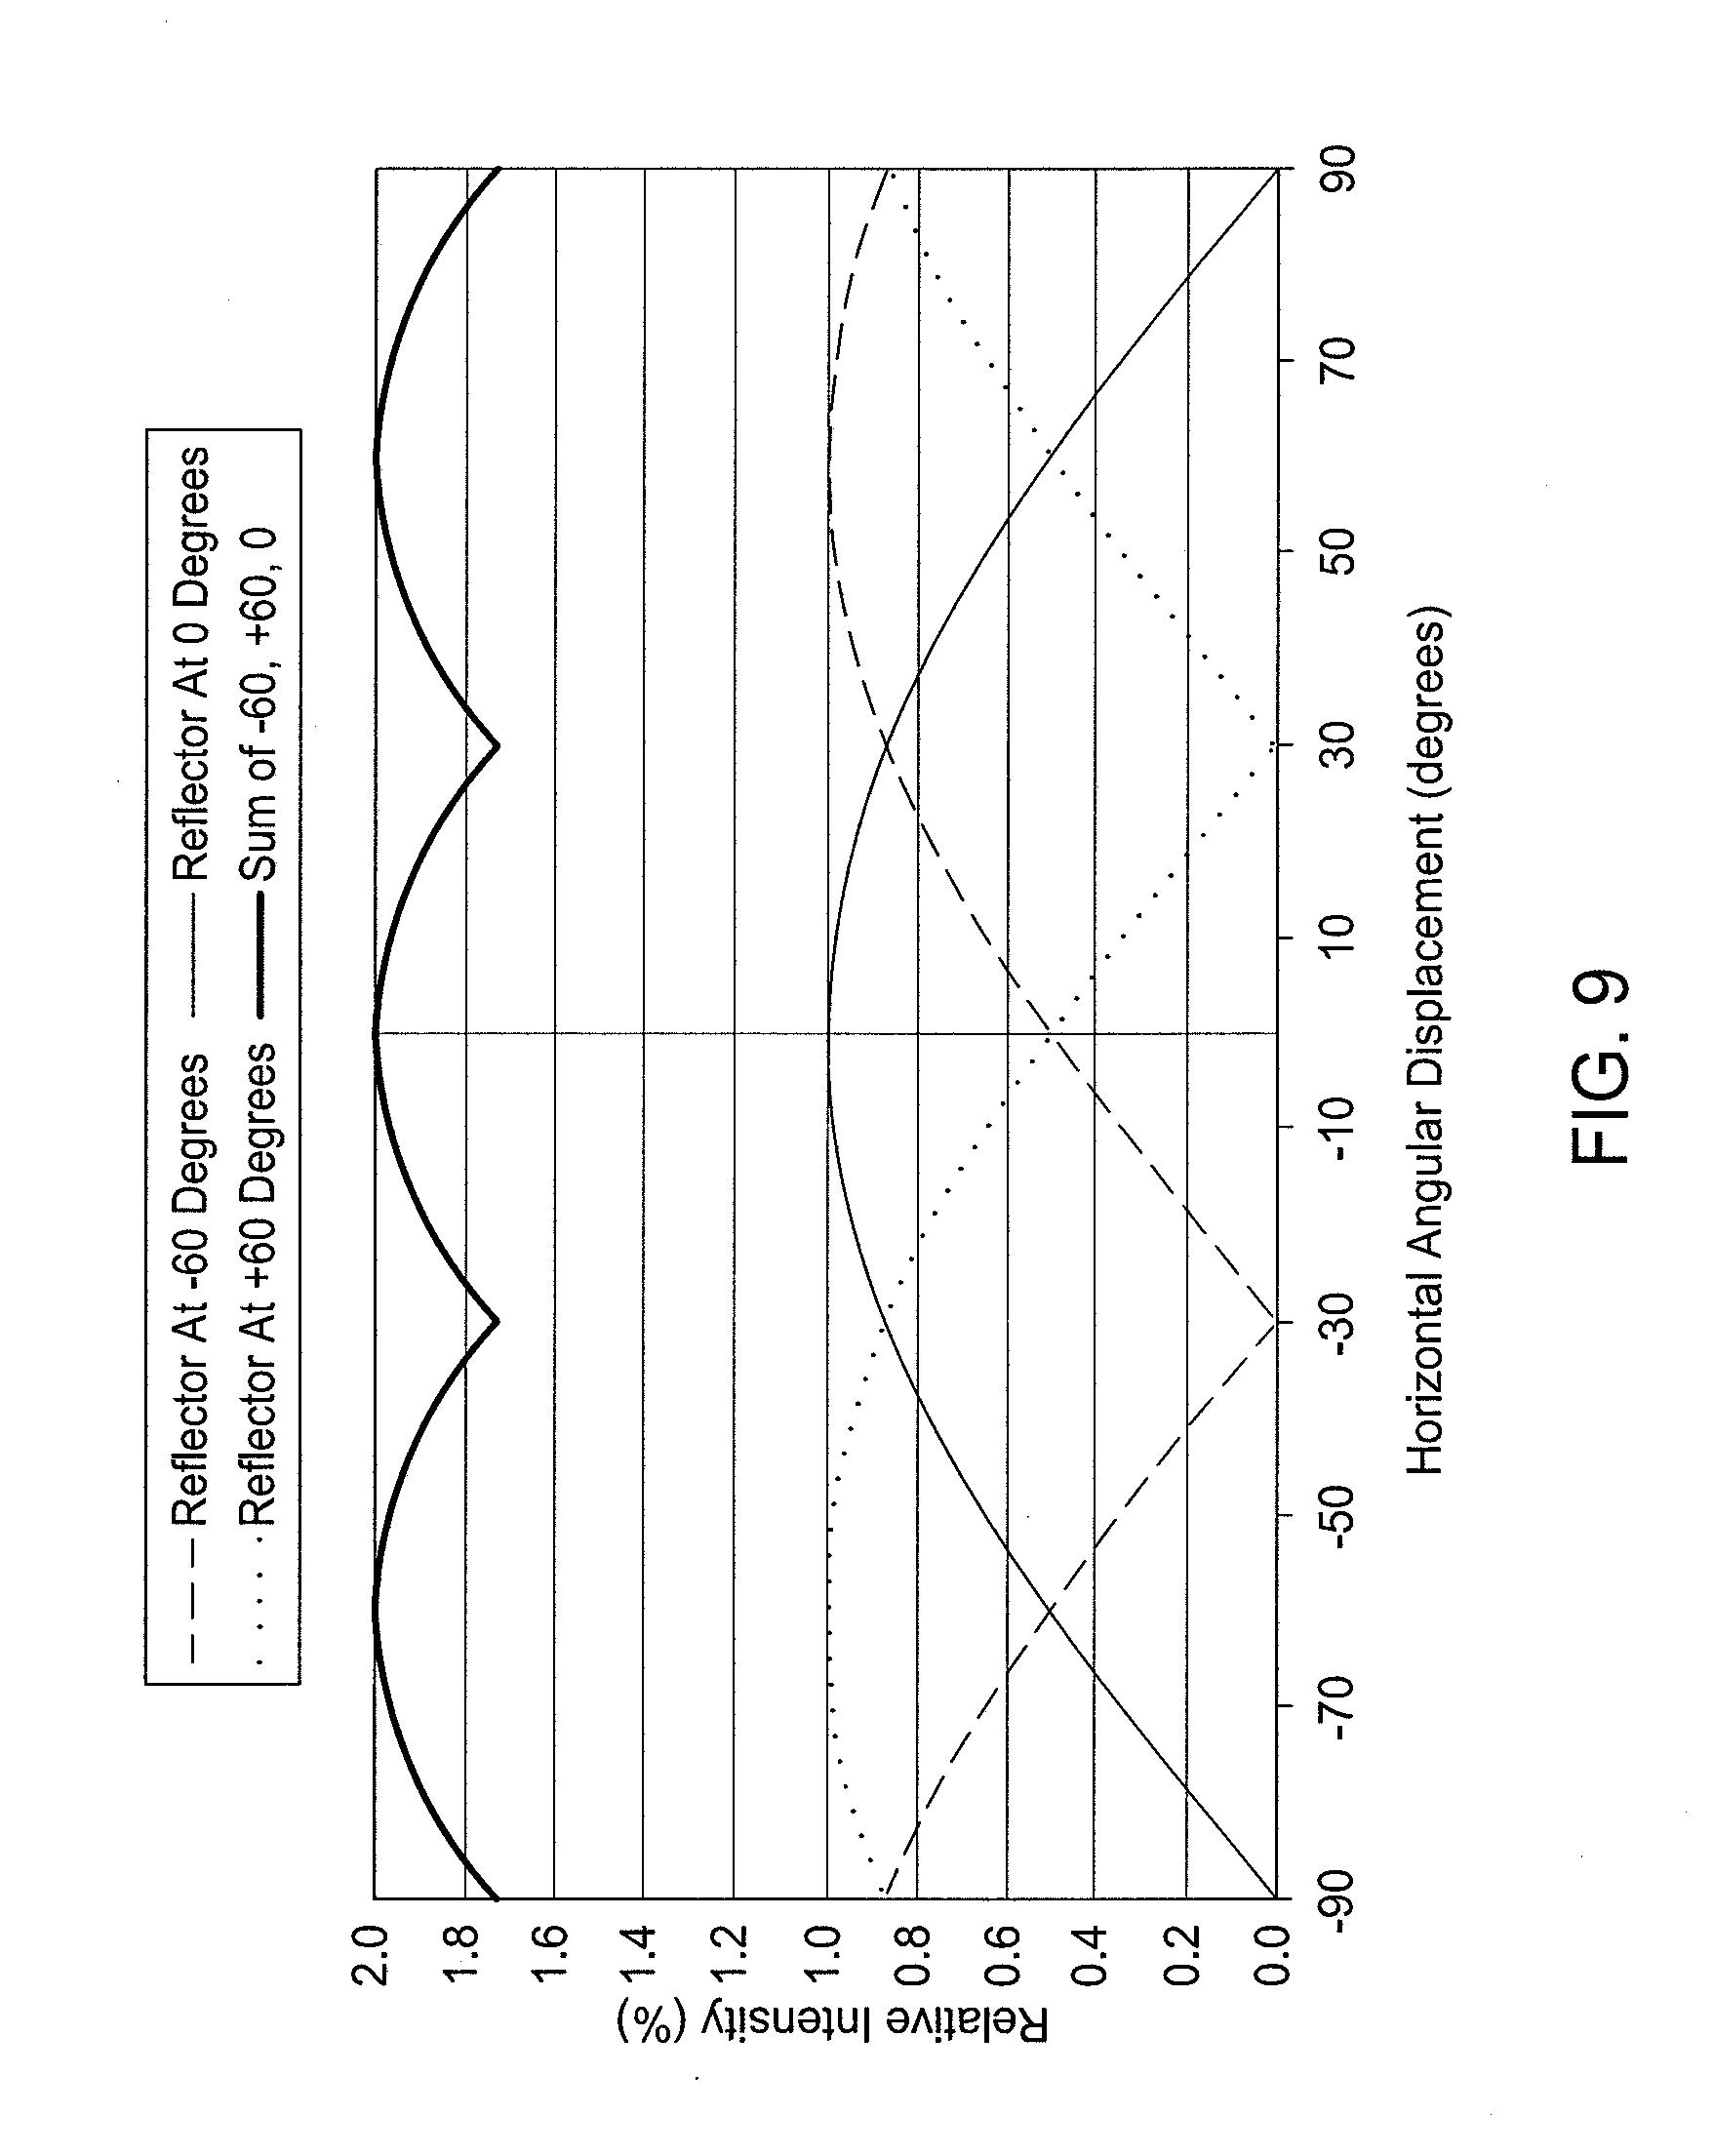 Relative Intensity Chart